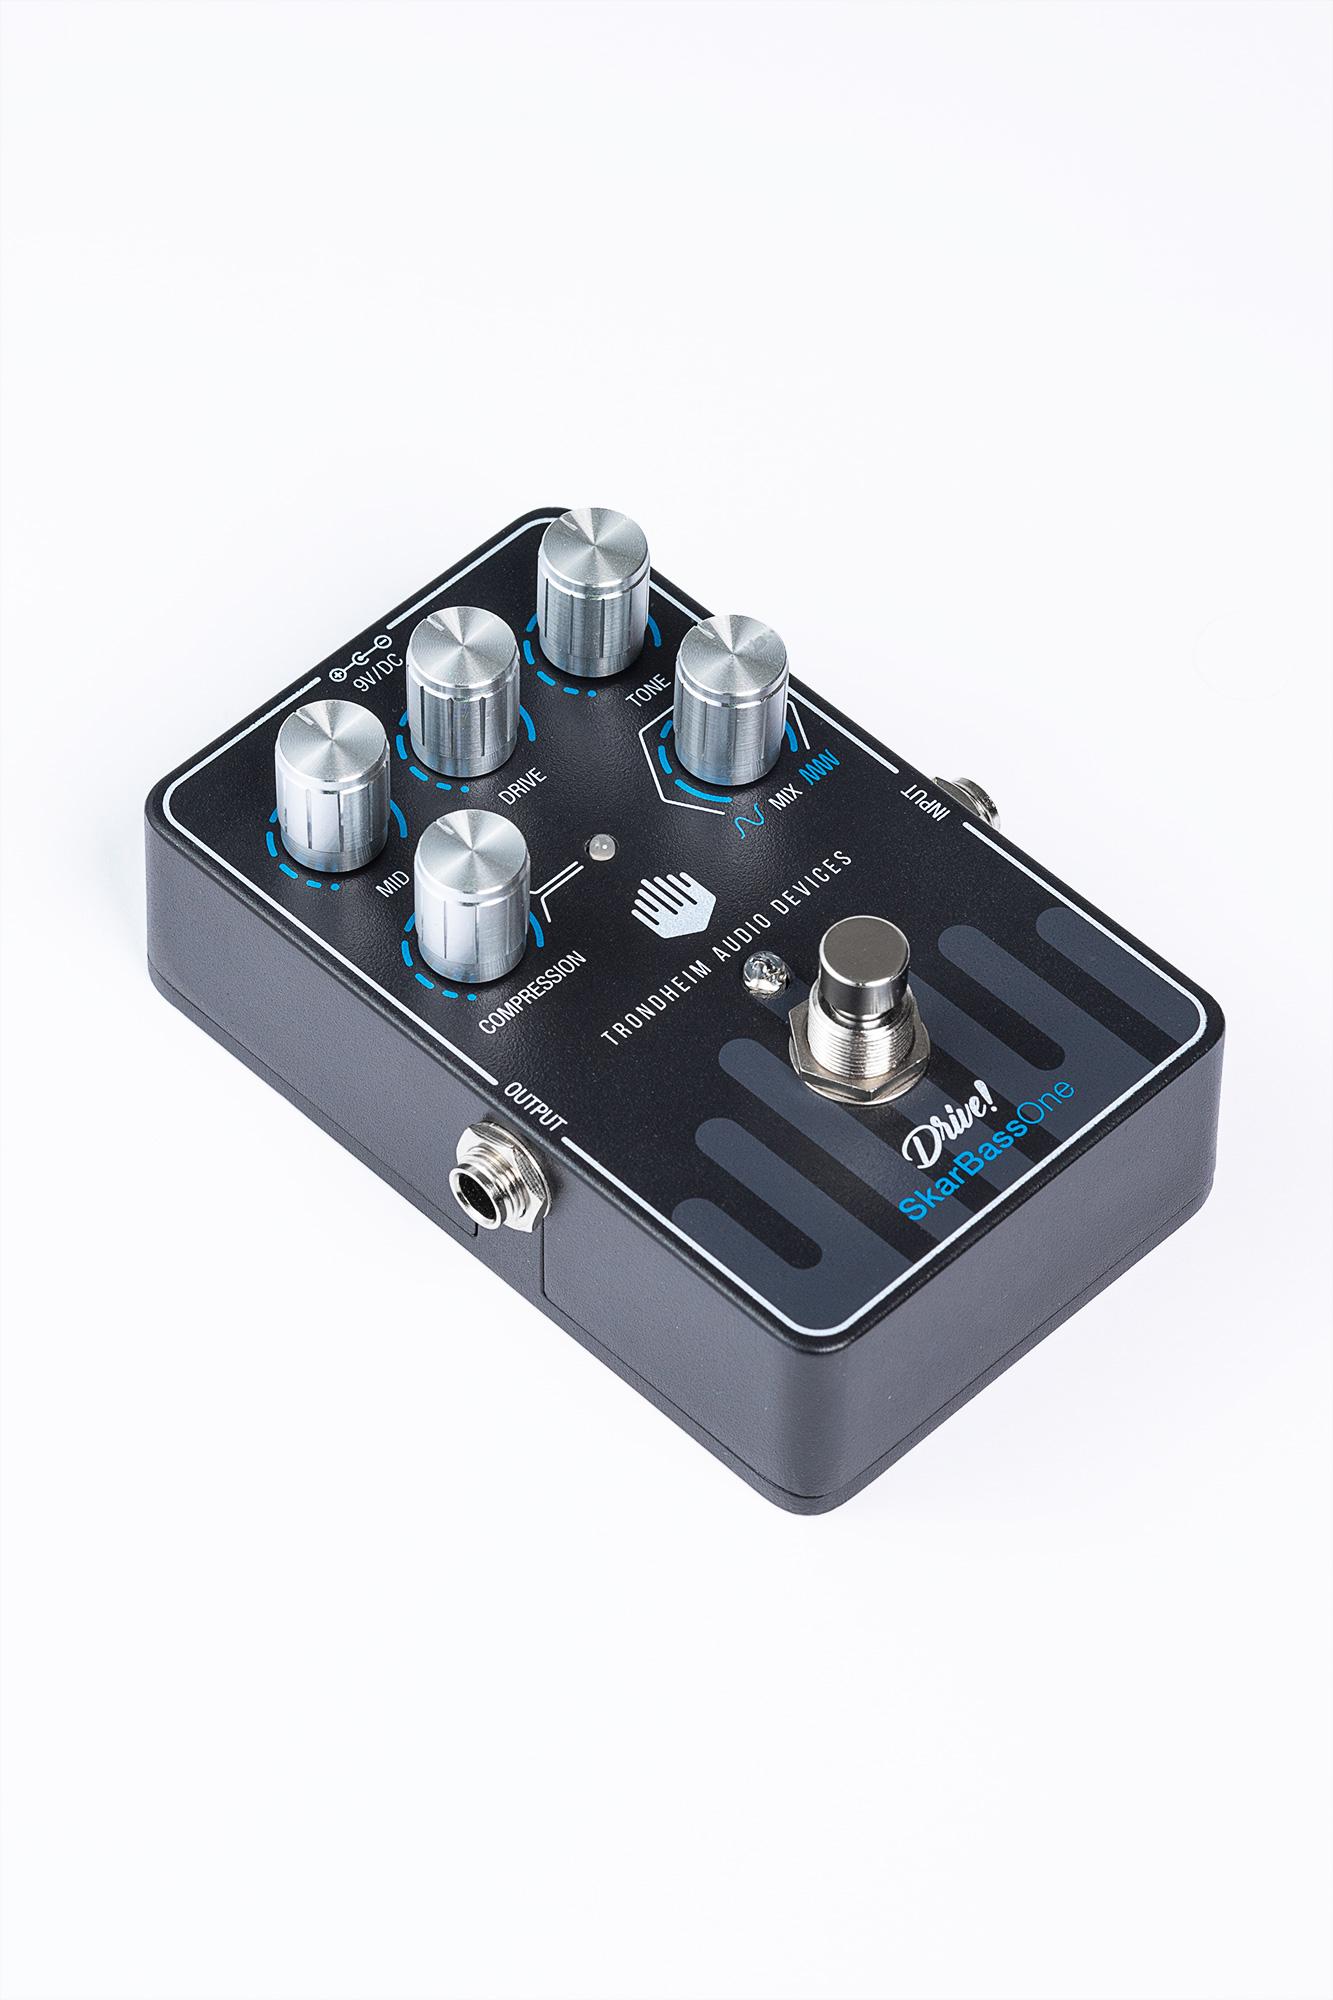 SkarBassOne Analog Bass Processor